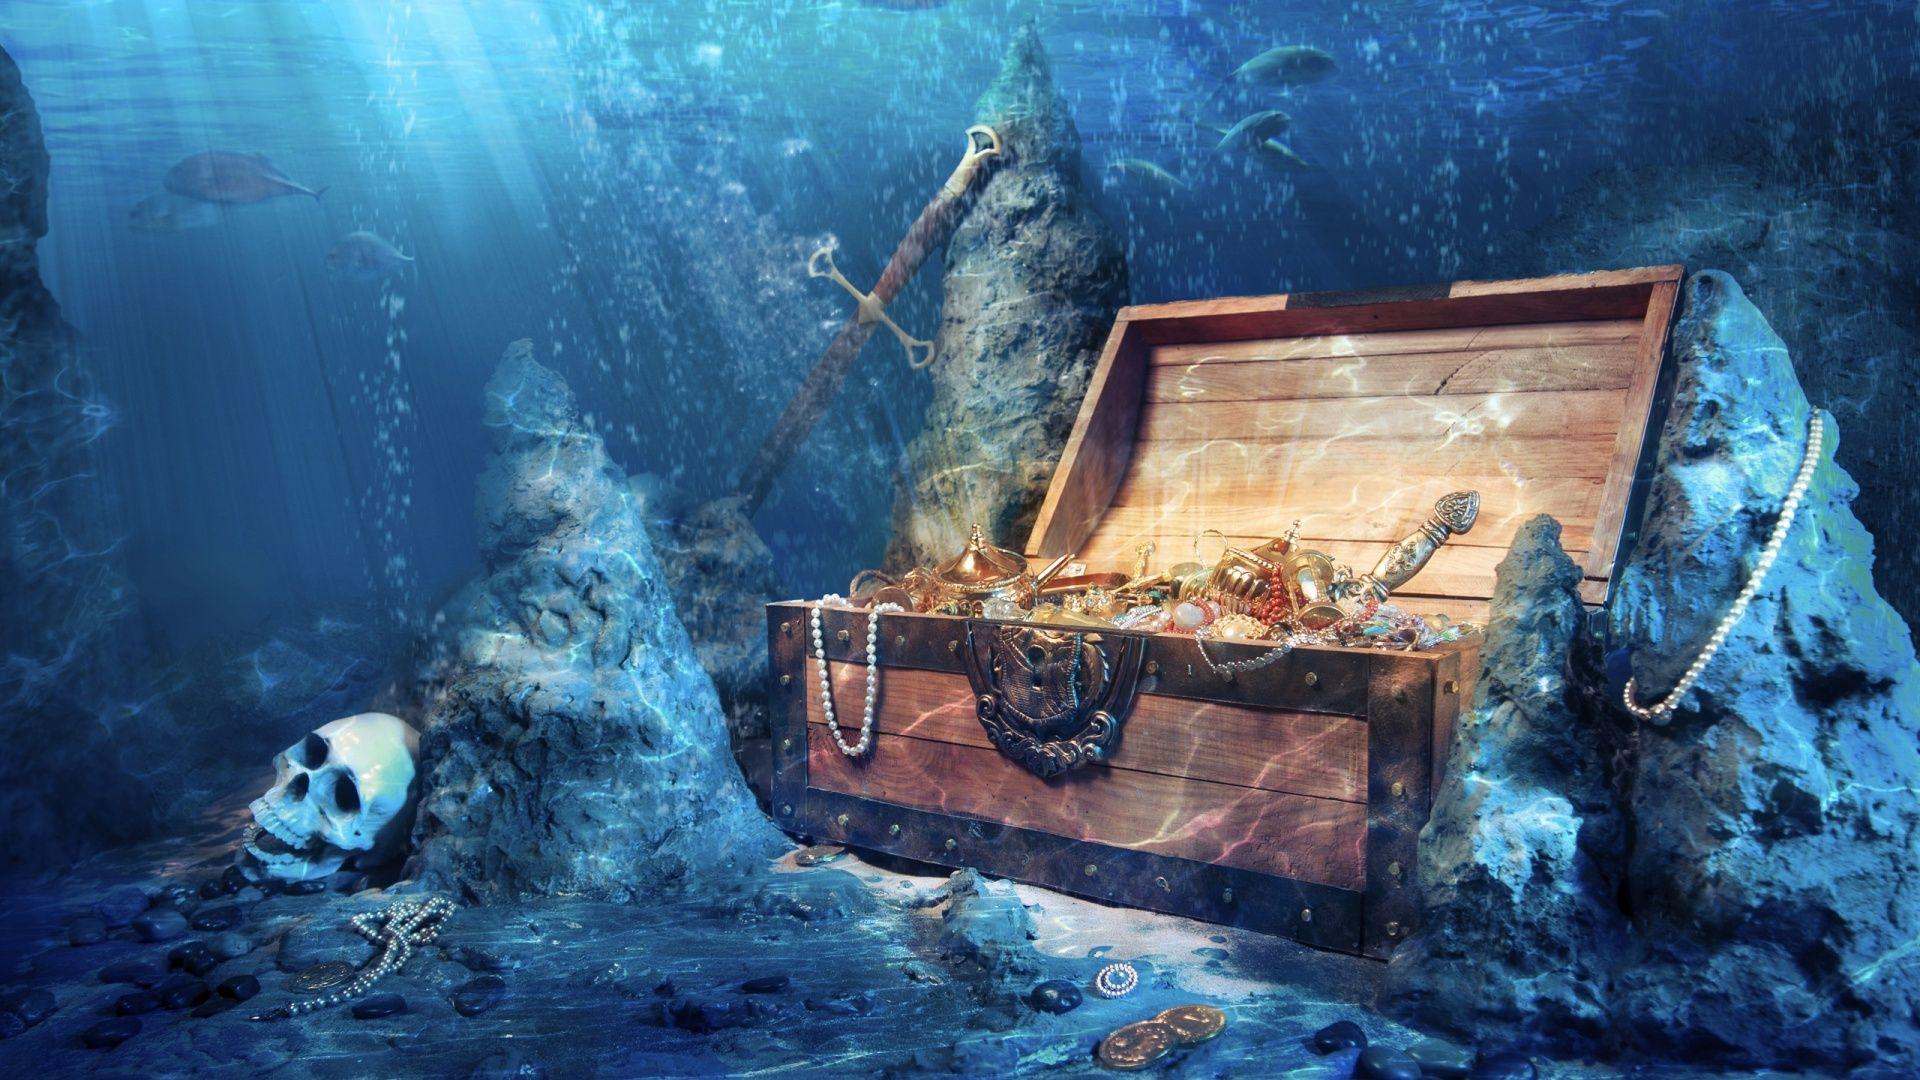 Treasure Underwater Wallpapers 1920x1080 What lifes beneath